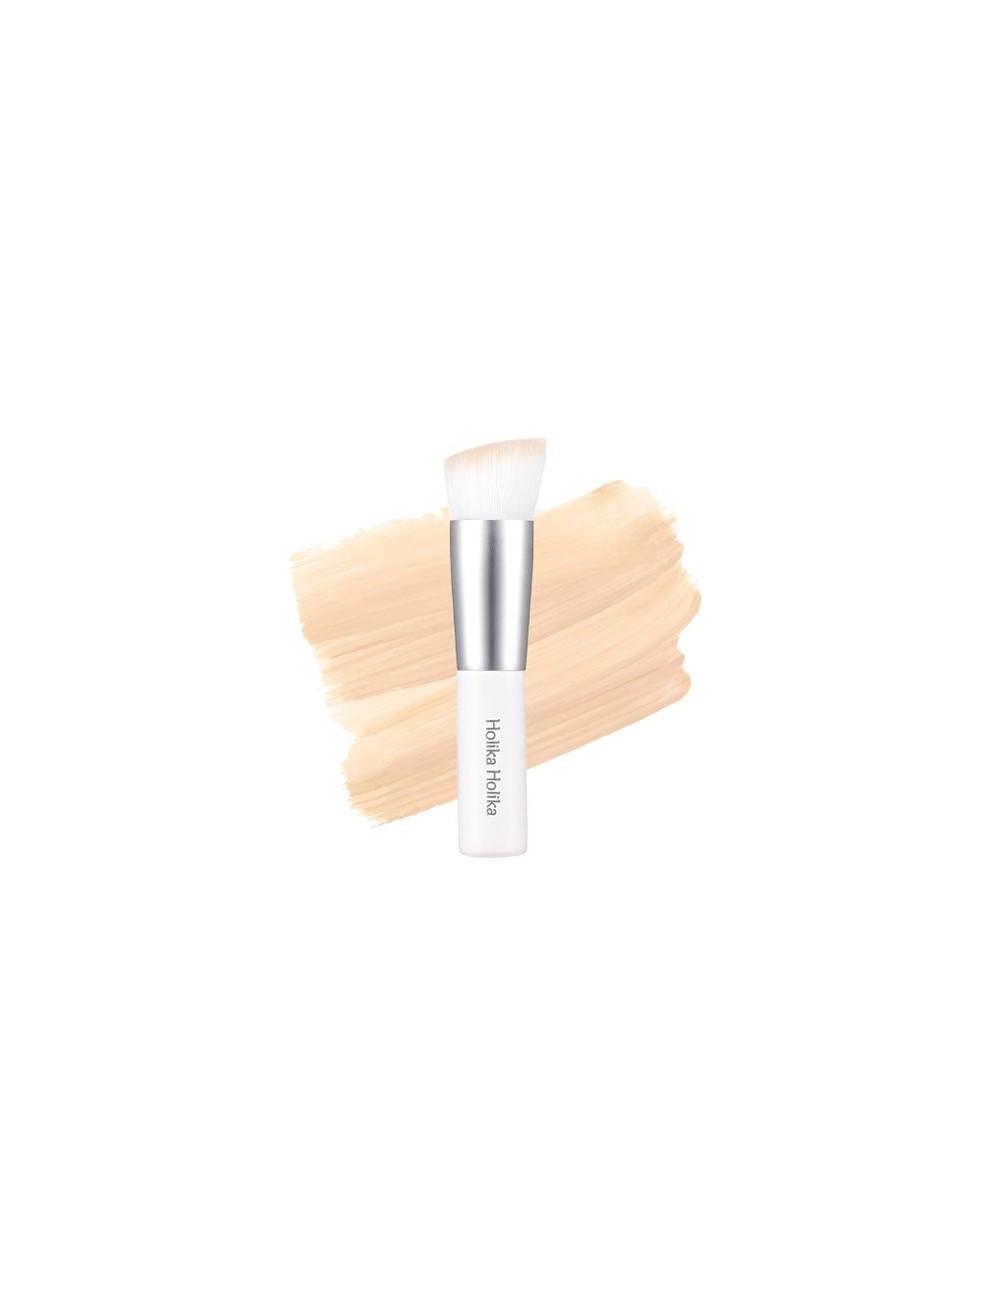 Brocha para Base de Maquillaje Holika Holika Feathery Mini Angle Brush